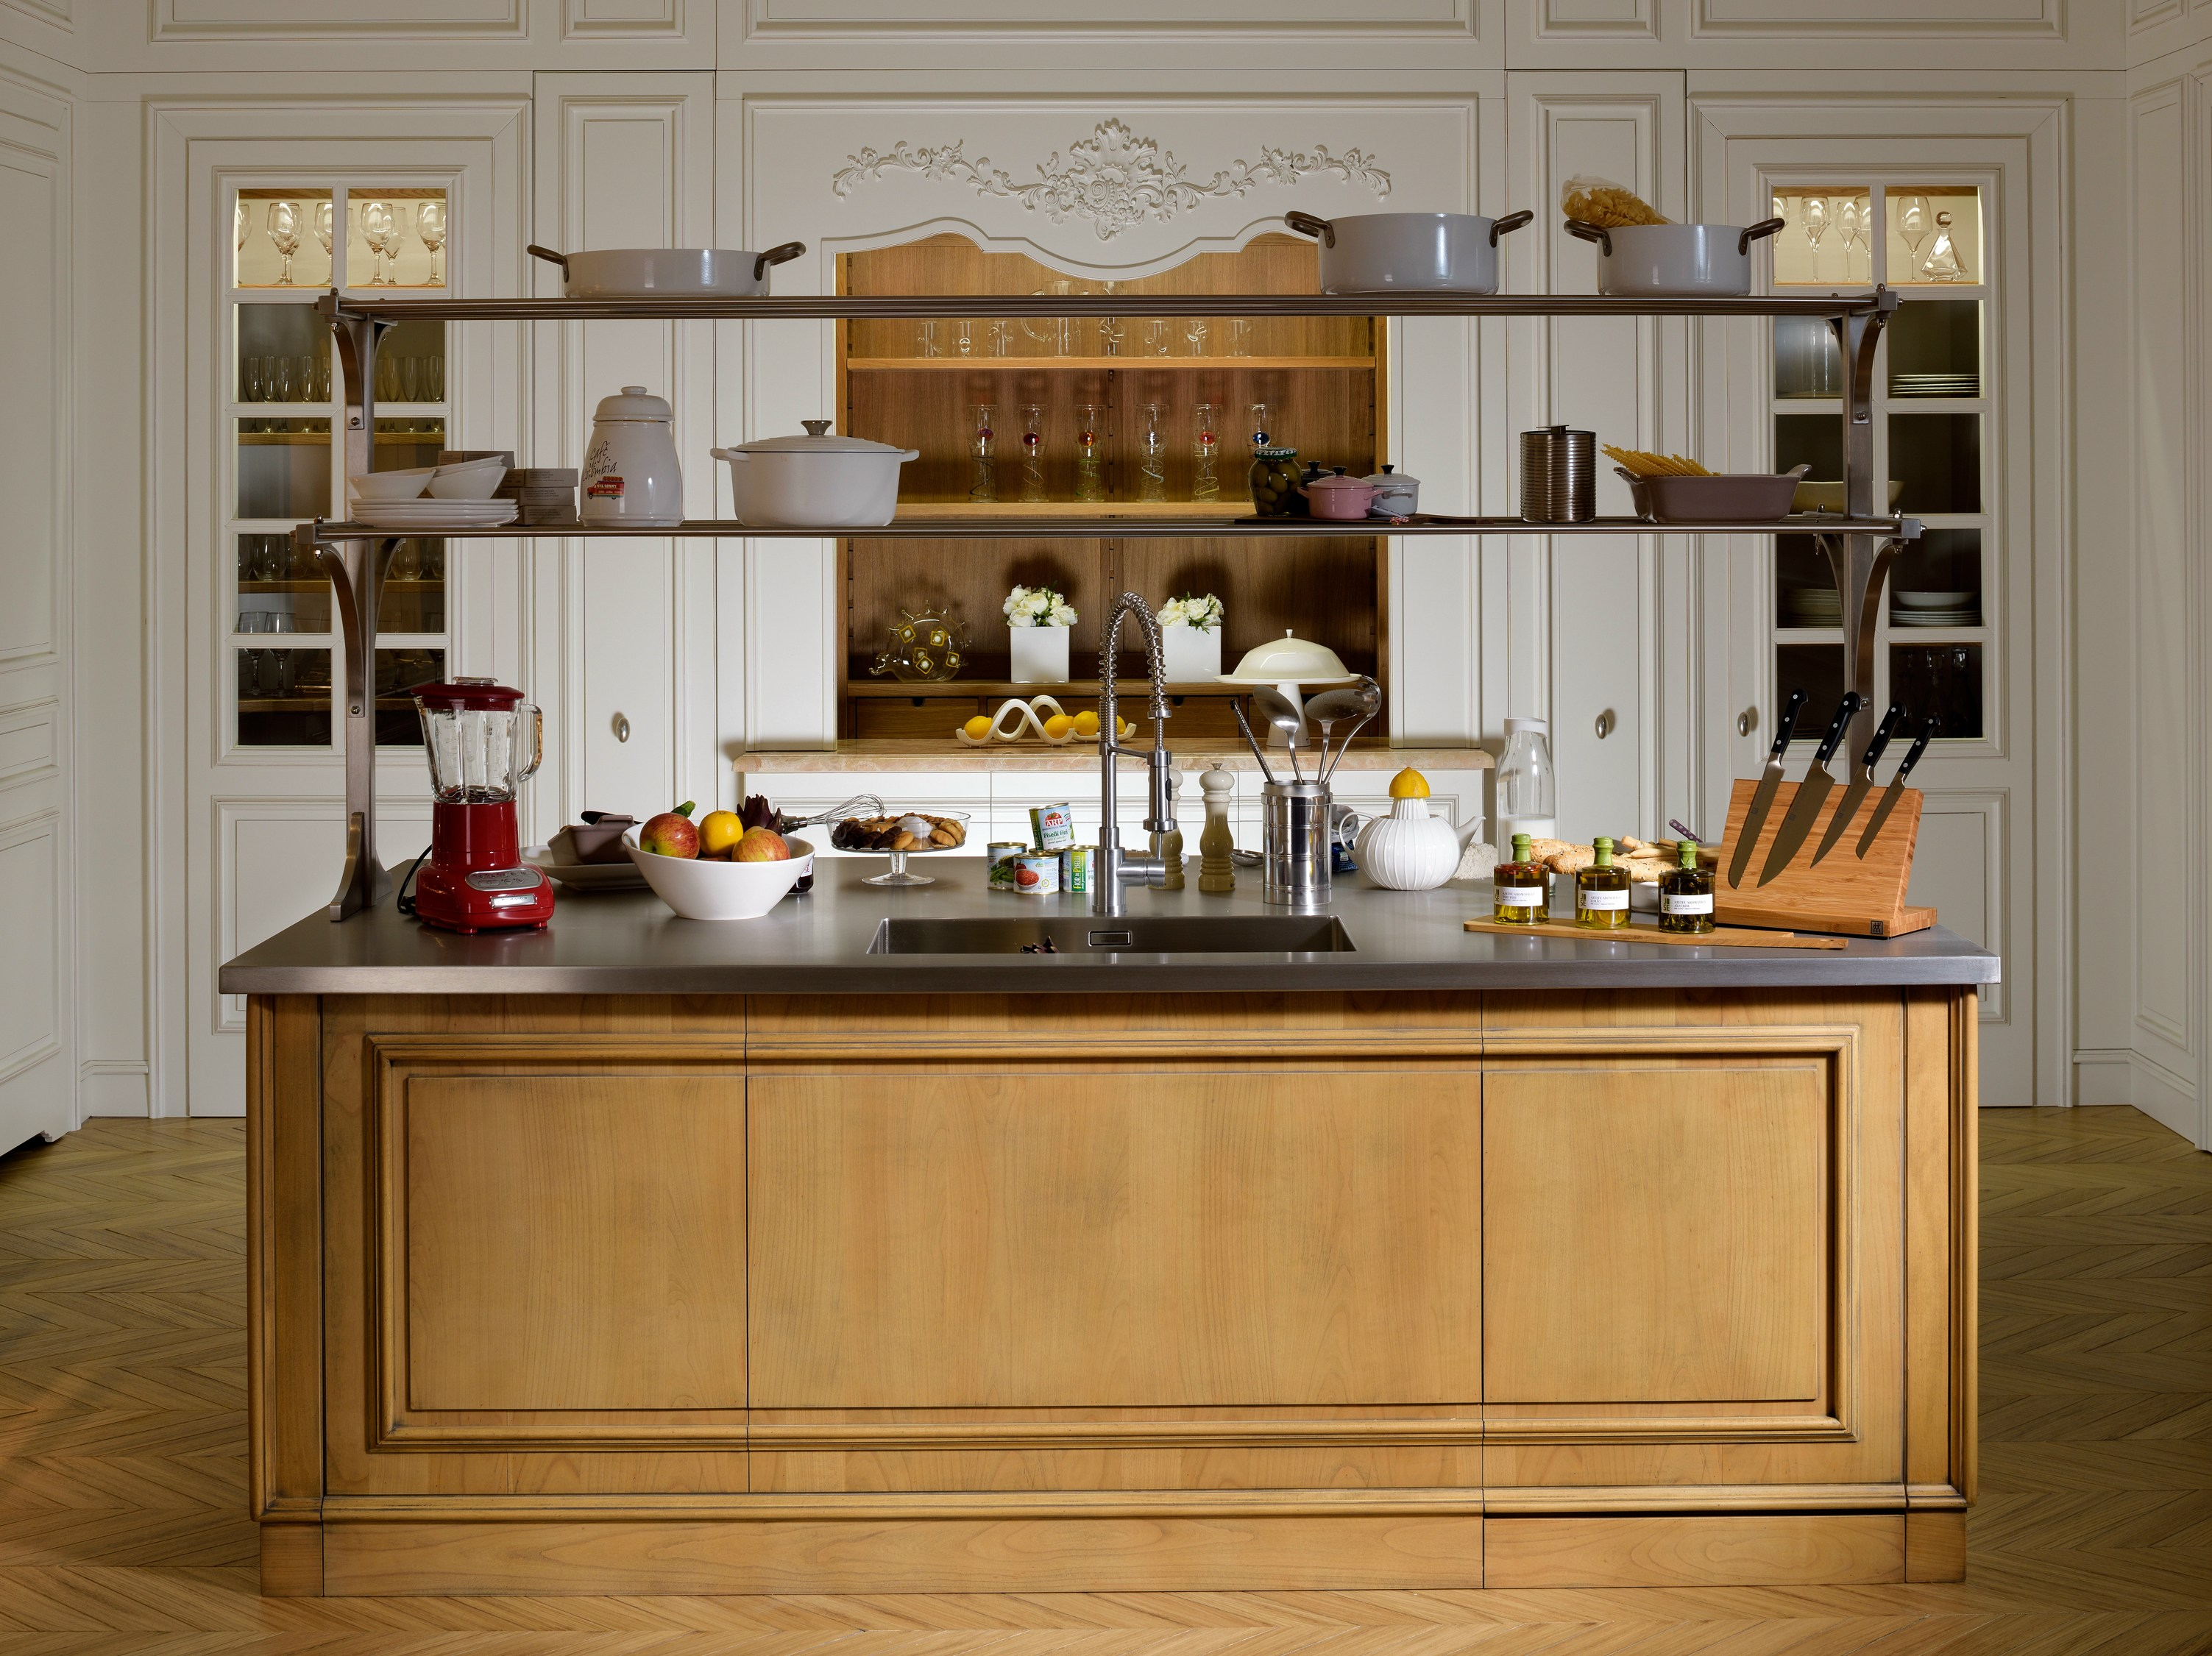 Stunning Cucine L Ottocento Prezzi Photos - Design & Ideas 2017 ...